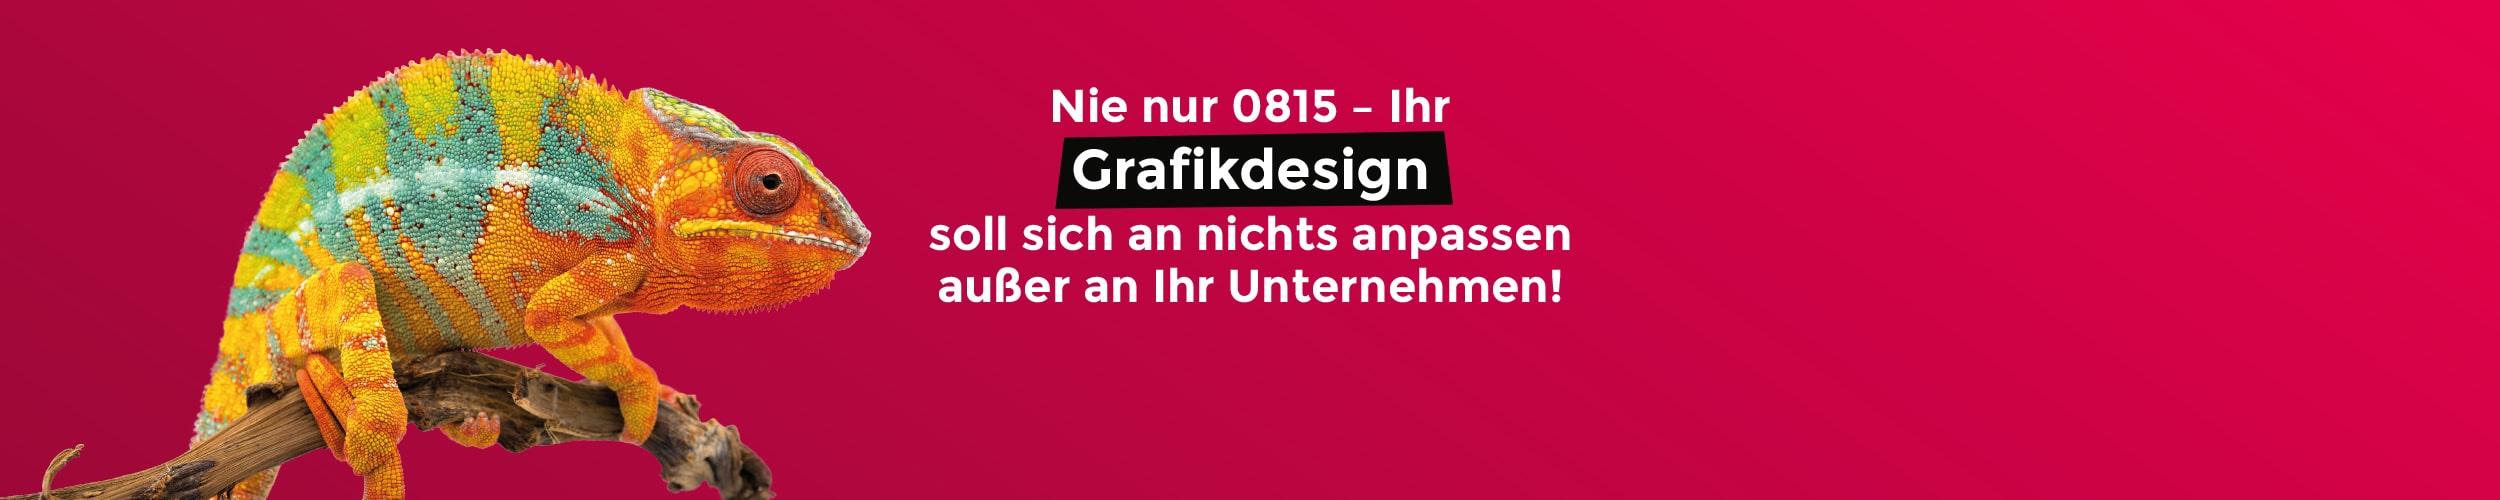 Werbeagentur purpix - Grafikdesign Rosenheim